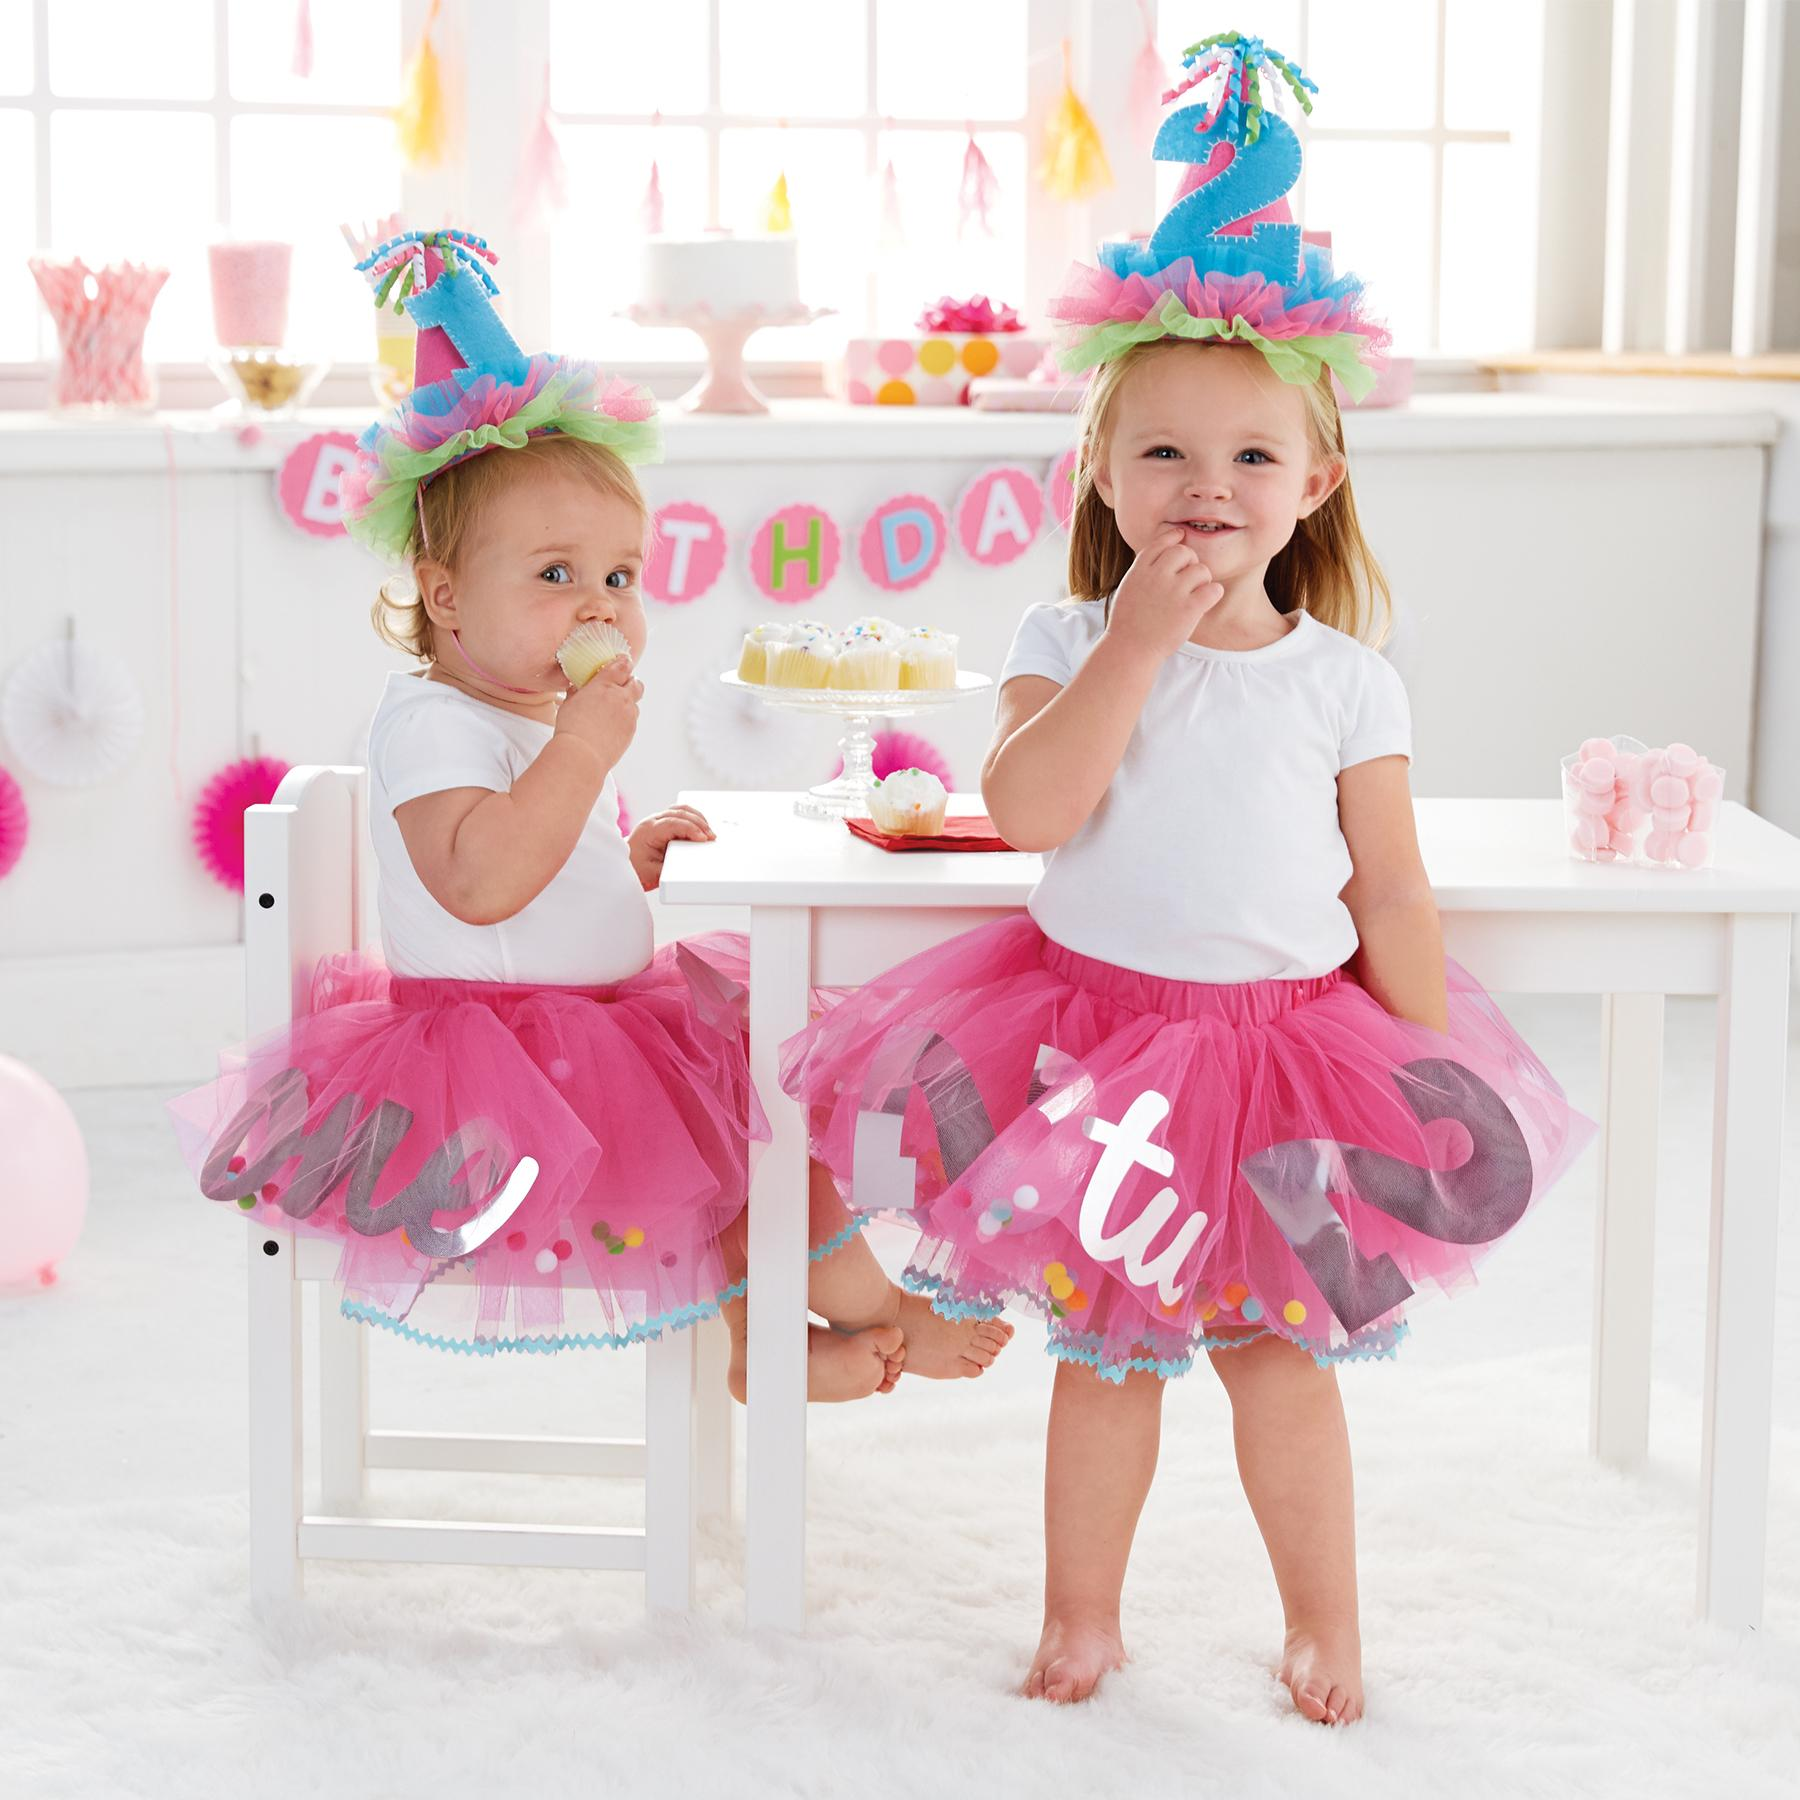 Amazon.com: Mud Pie Baby Girl's Birthday Tutu, Multi, One Size ...